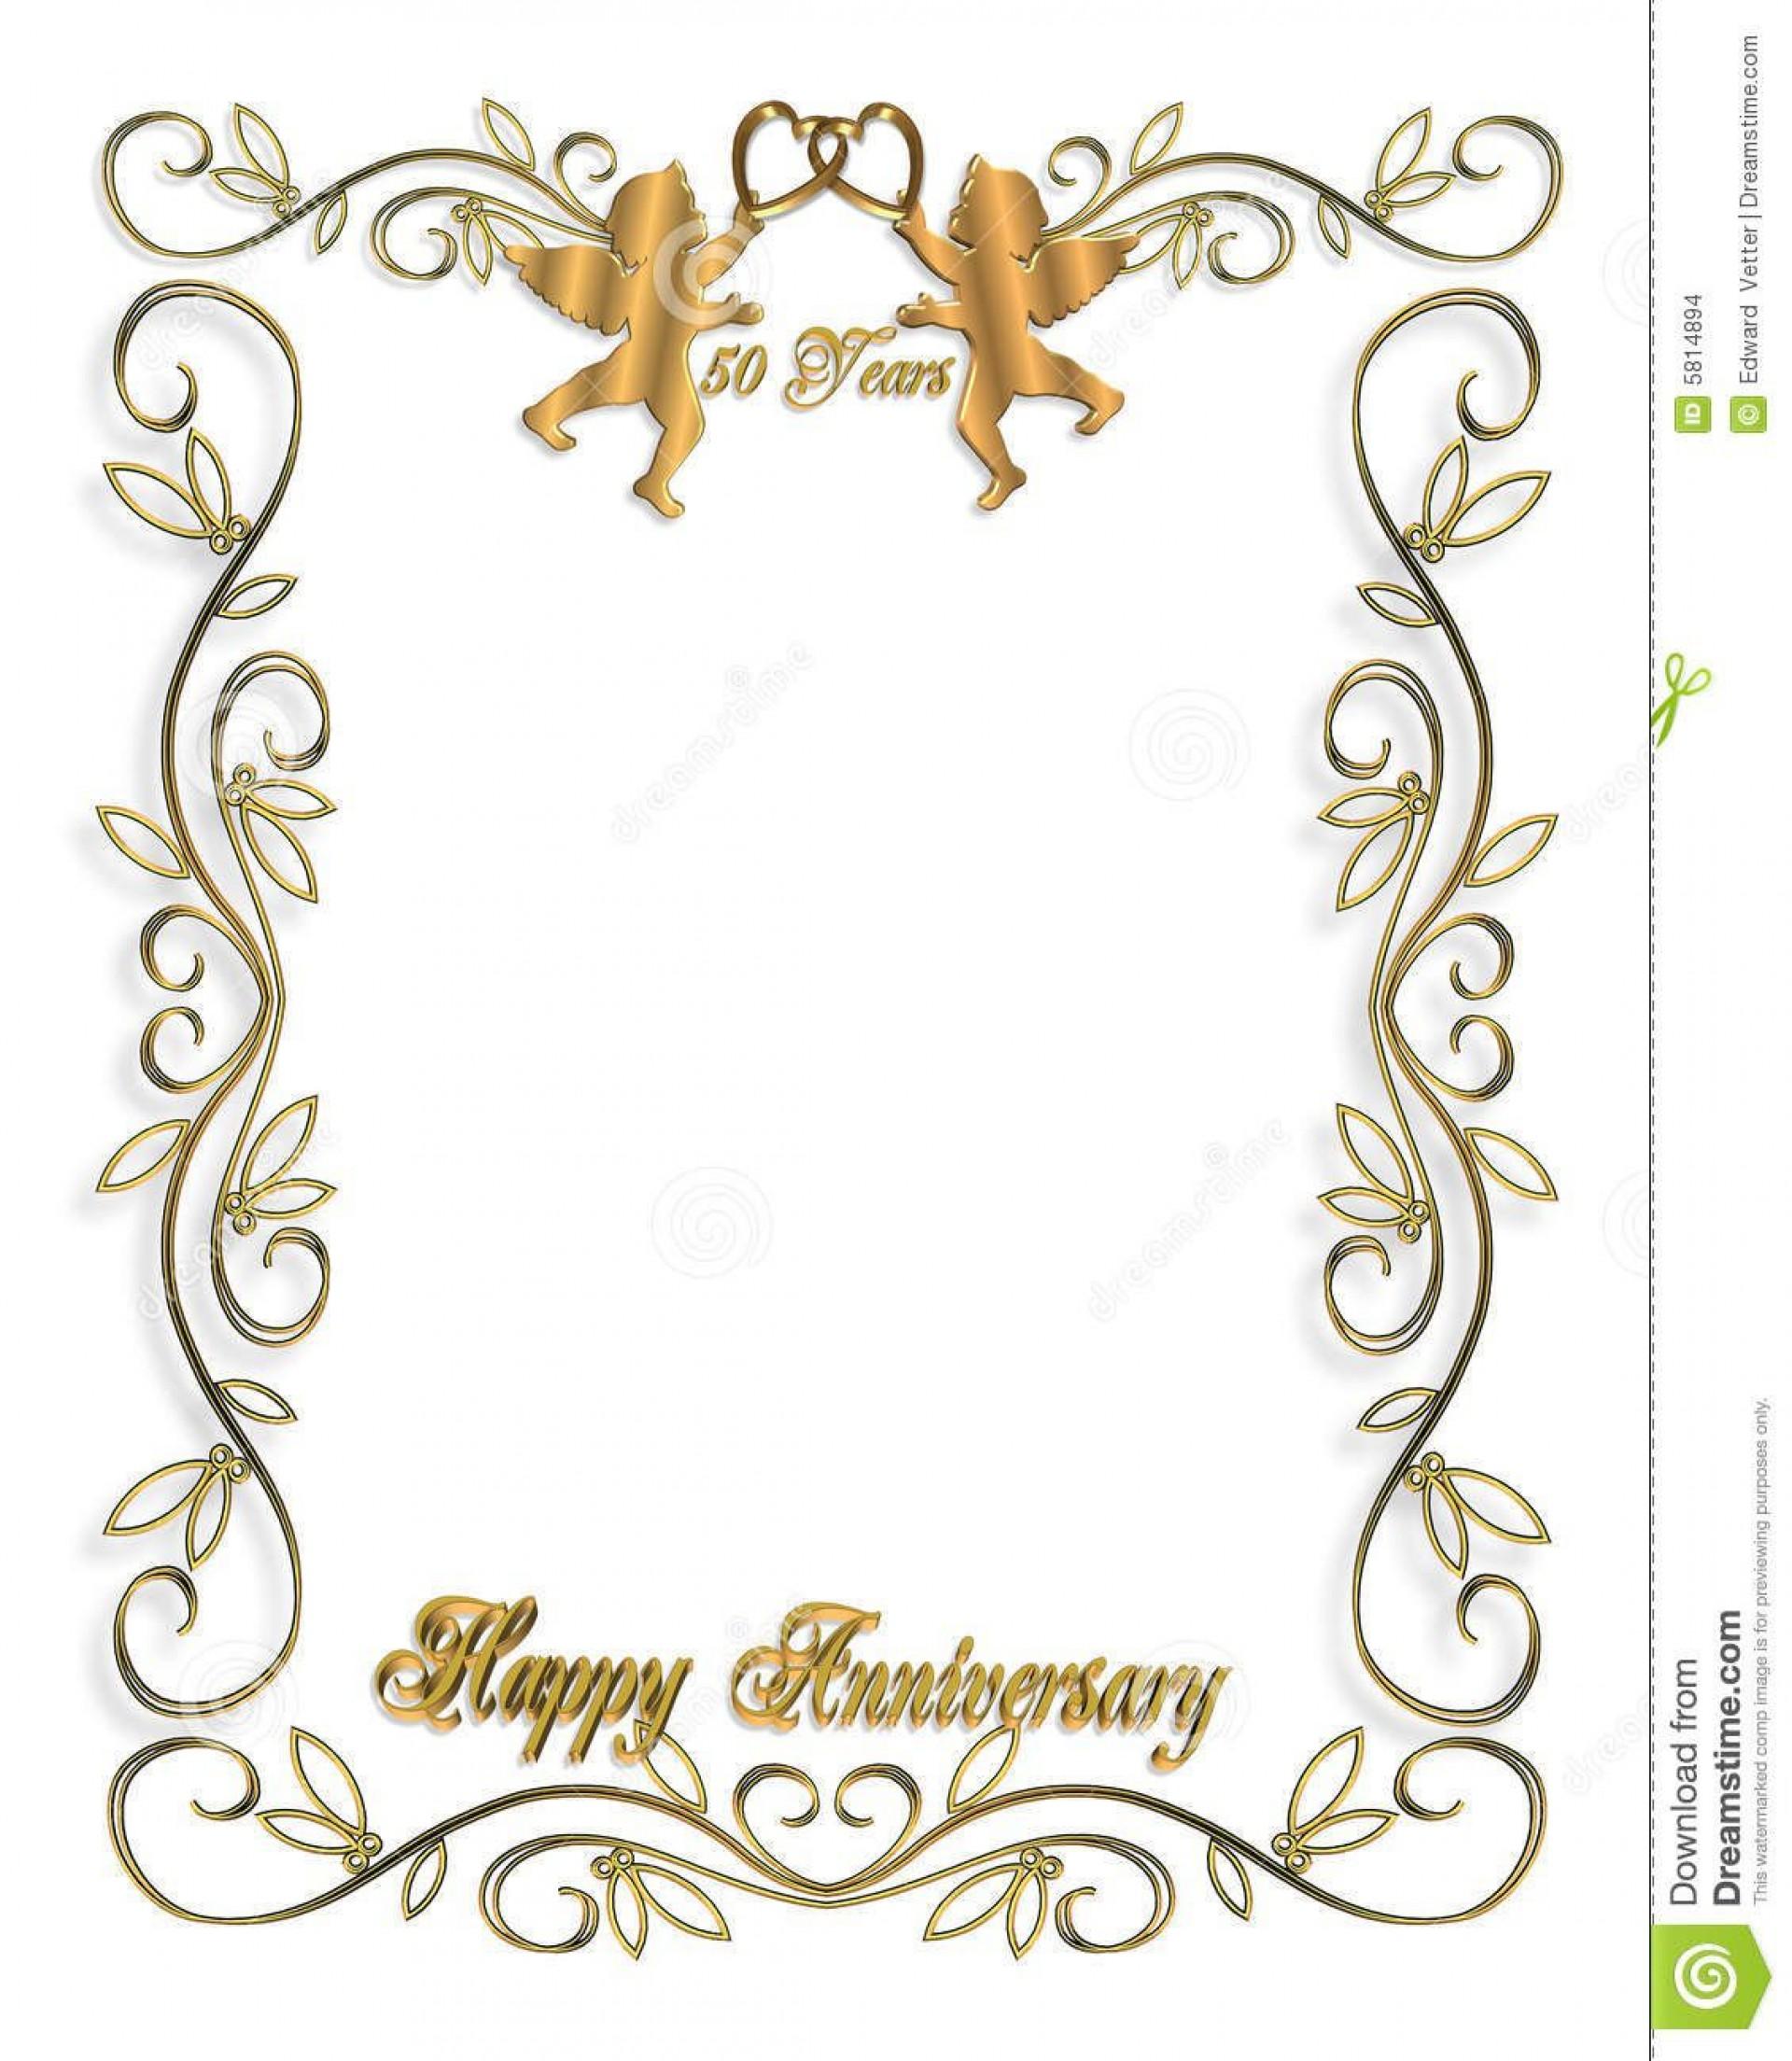 010 Striking 50th Wedding Anniversary Invitation Template Free Download Inspiration  Golden1920